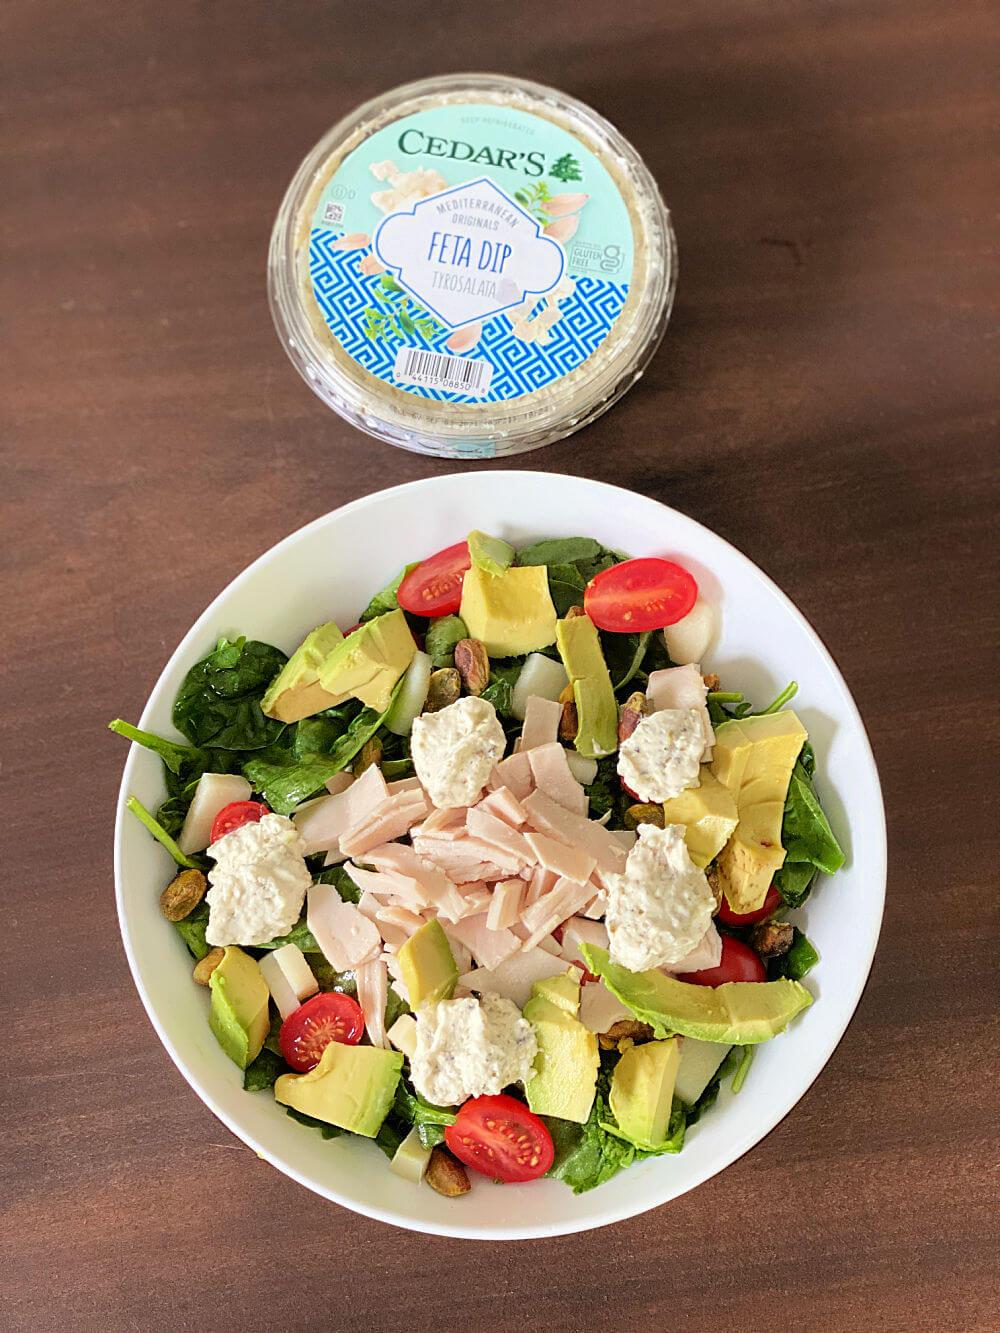 salad with cedar's feta dip